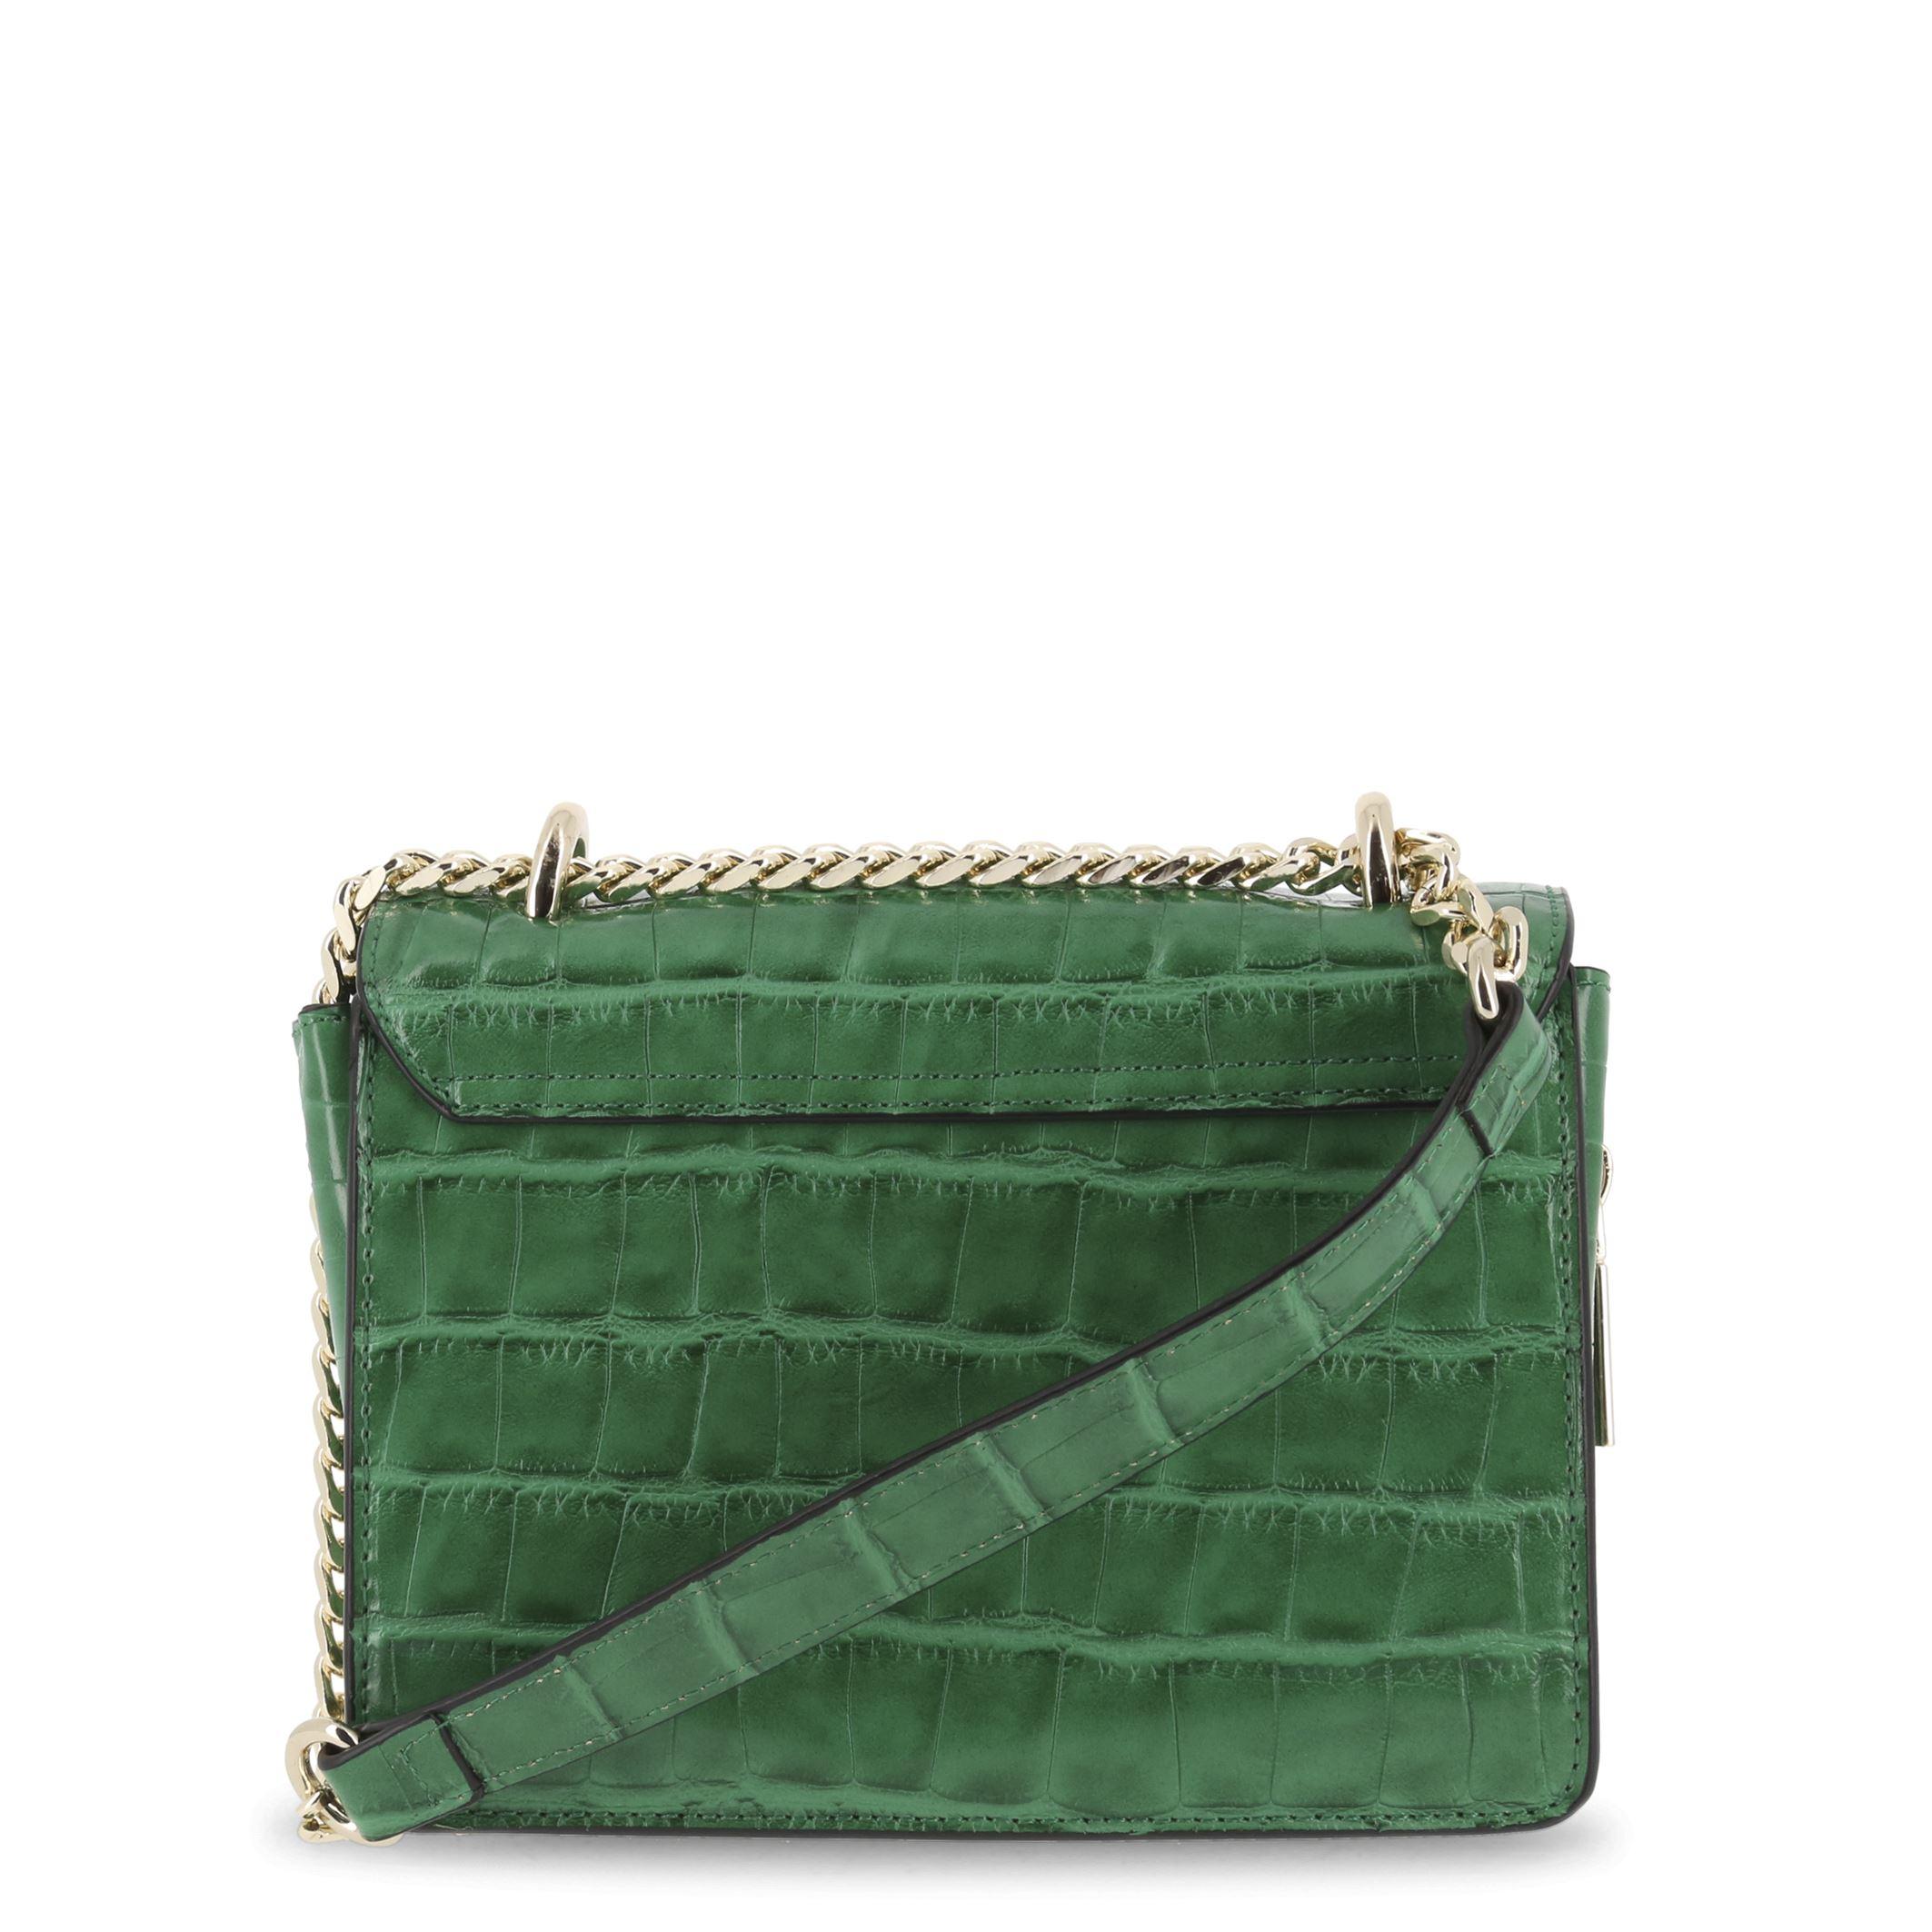 67bbb24048 Details about Versace Jeans Women s Green Cross-Body Shoulder Bag Metallic  Closure